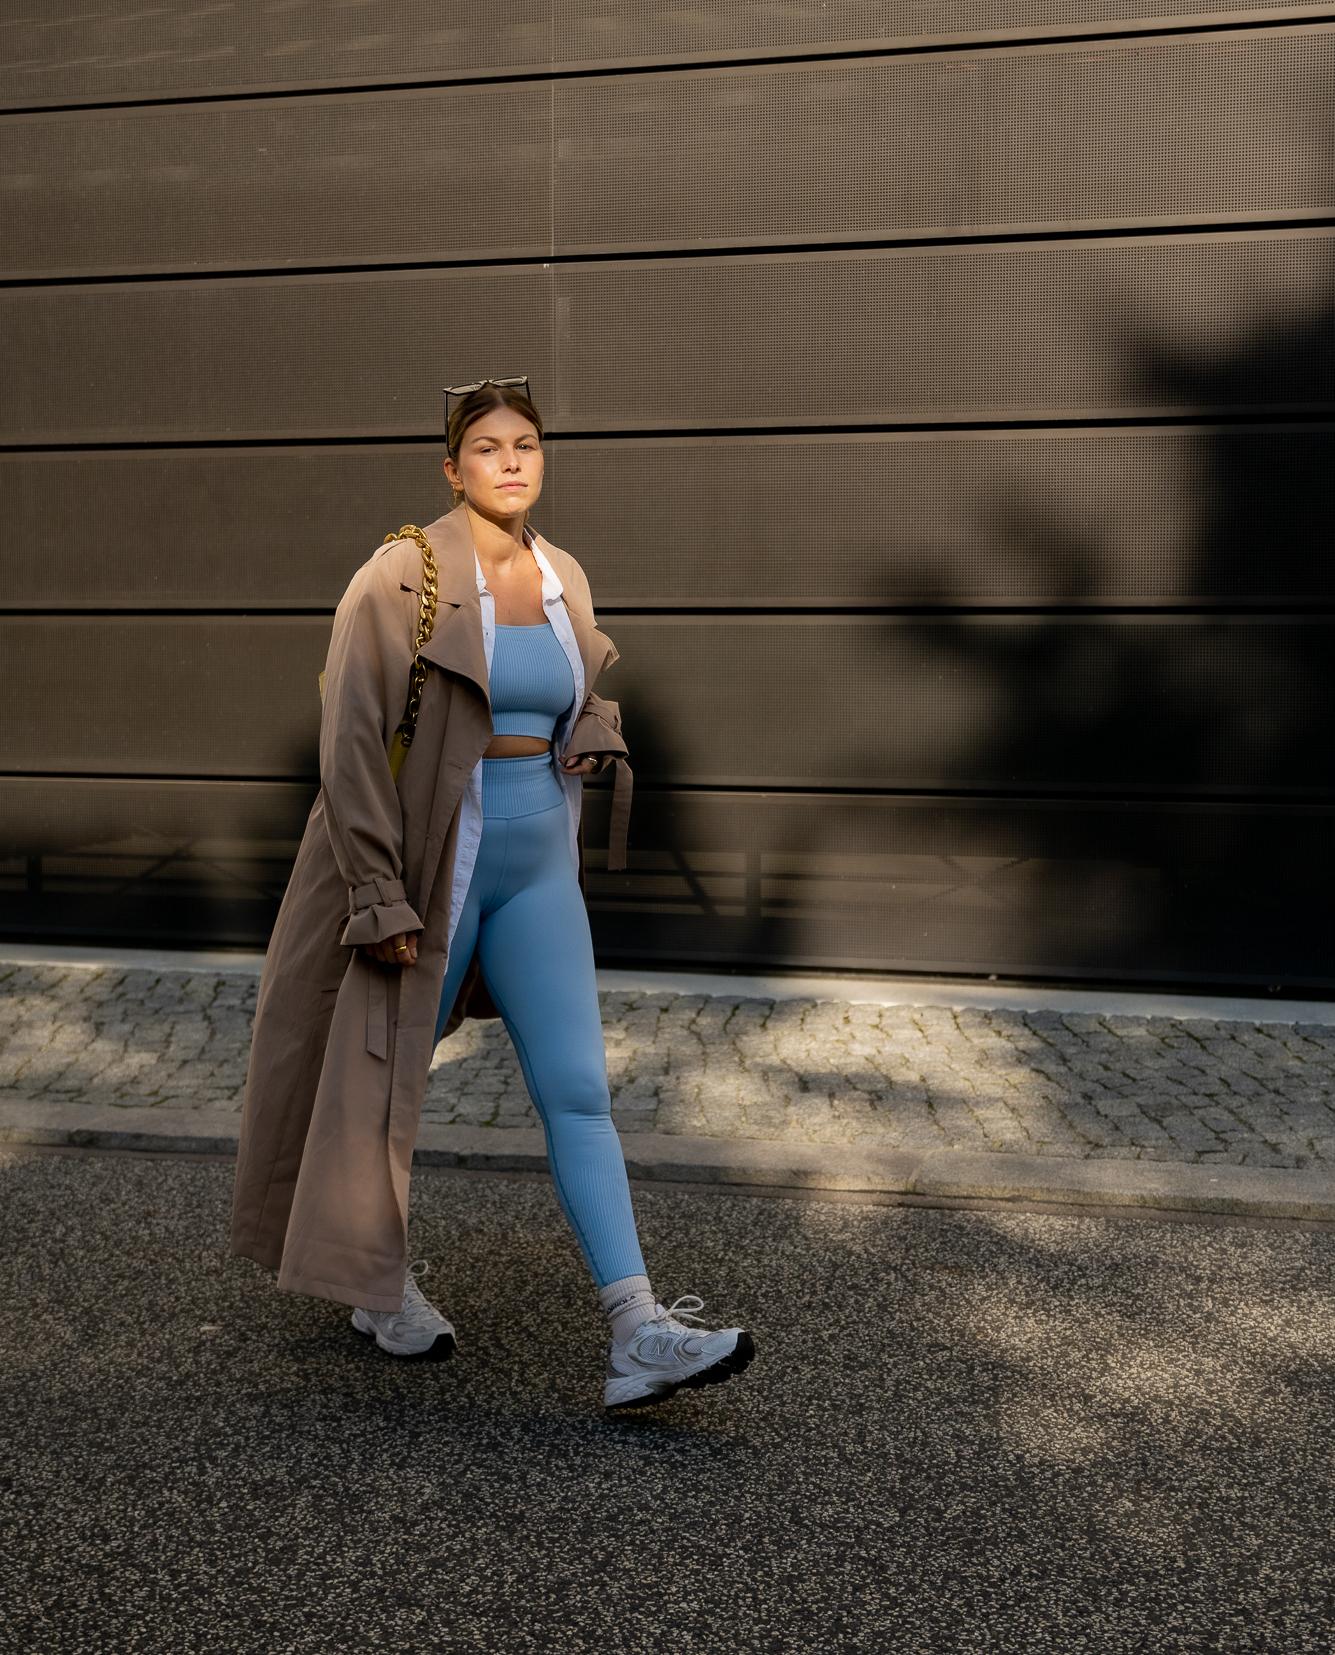 athleisure-outfits-trenchcoat-sneaker-new-balance-aline-kaplan-modeblog-berlin